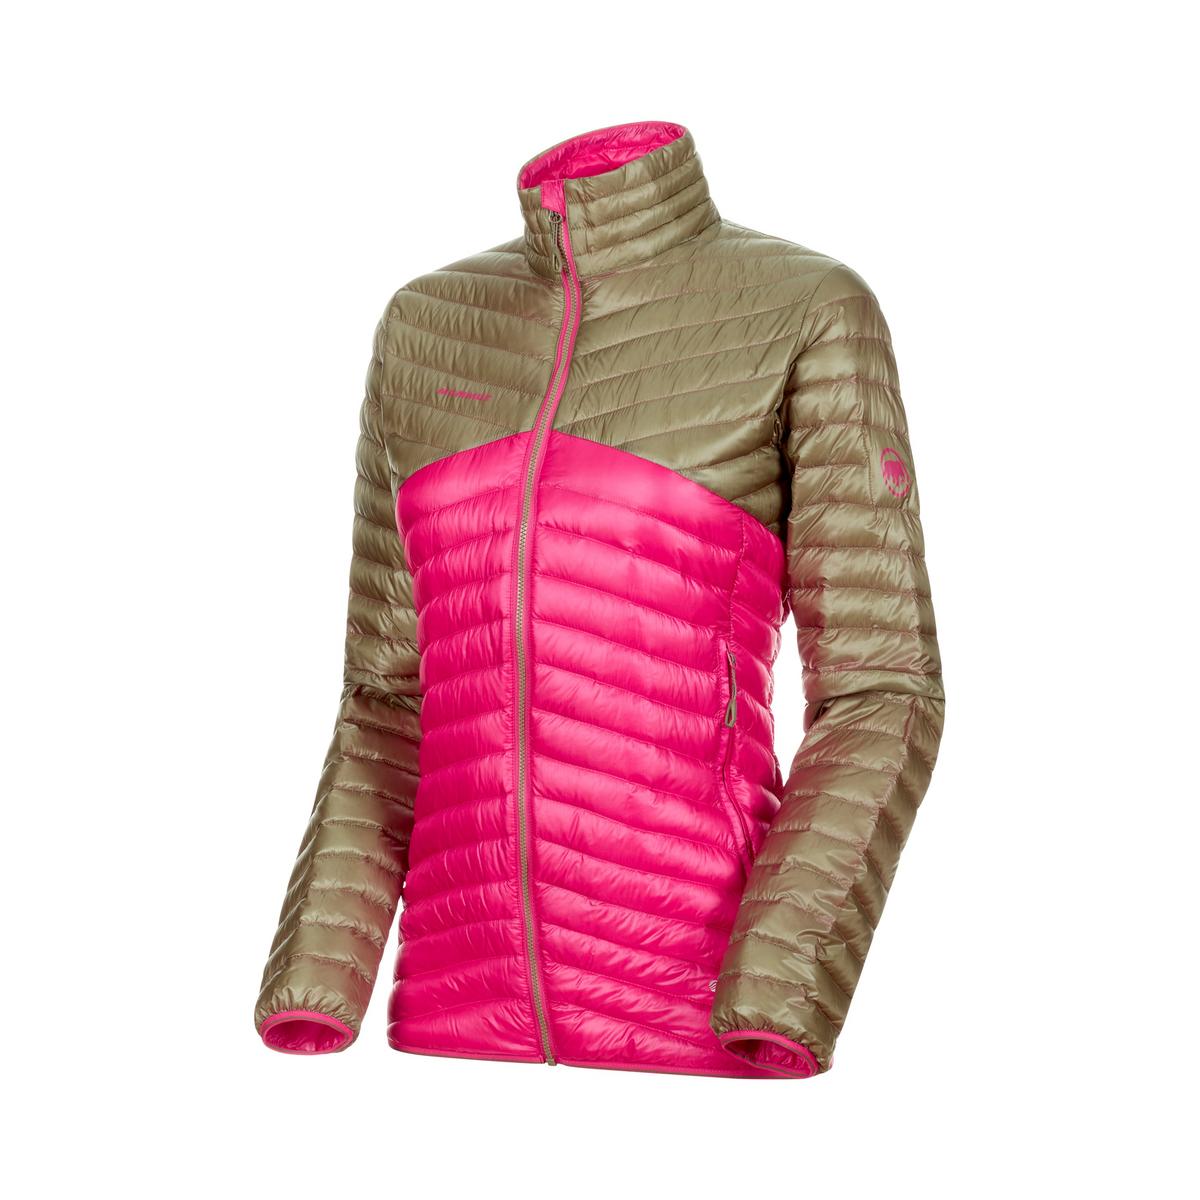 new product 05b70 9414f Broad Peak Light IN Jacket Women